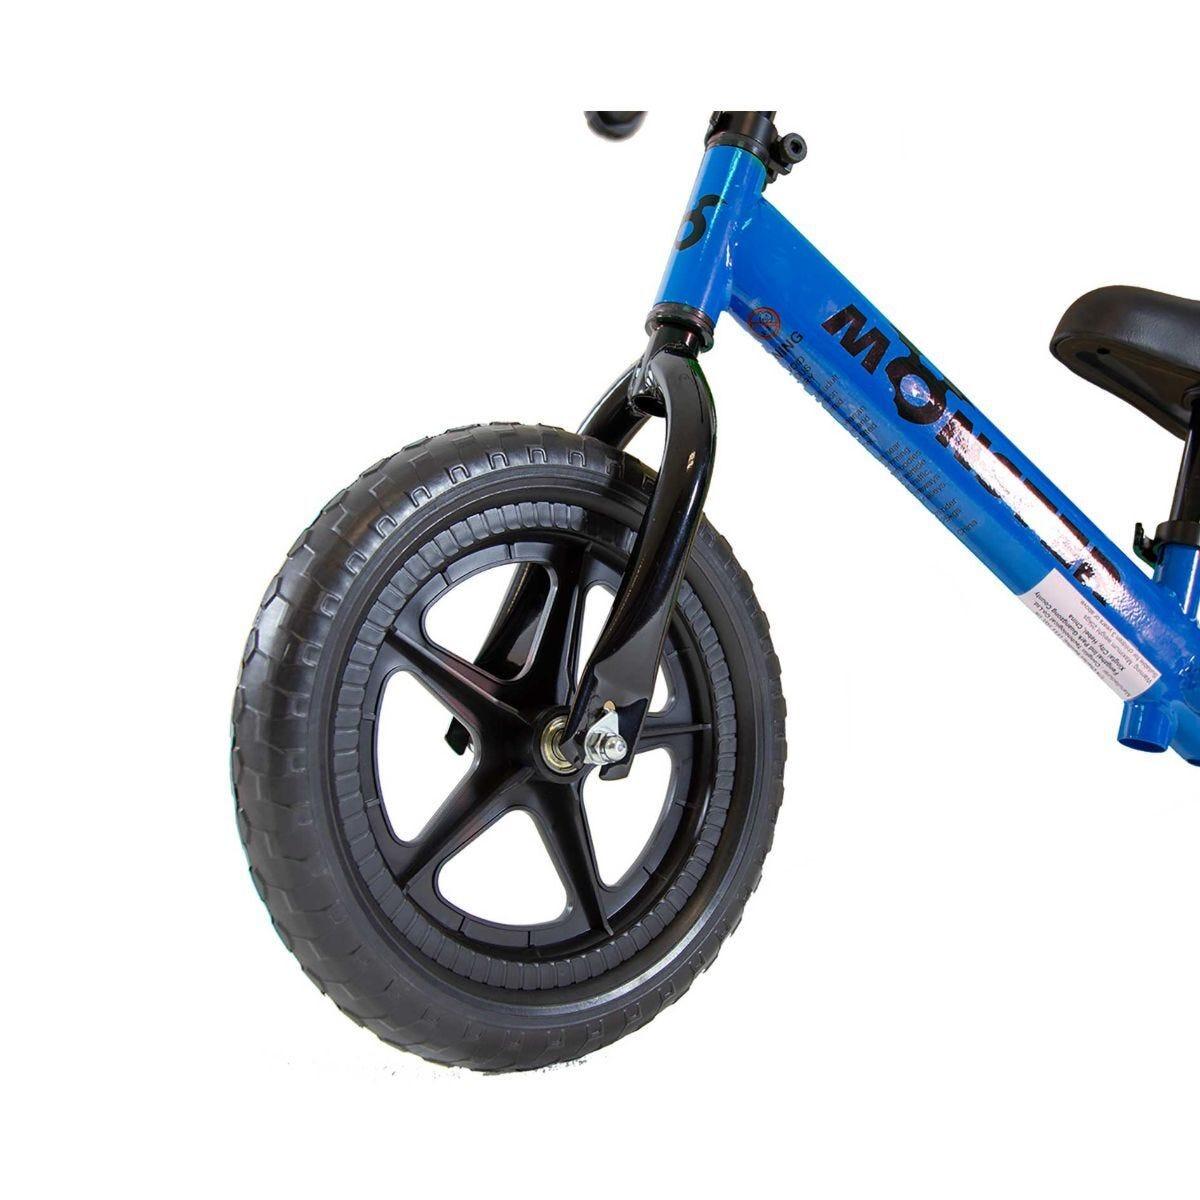 Charles Bentley Monster Kids 12 Inch Balance Training Bike Age 18 Months - 5 Years